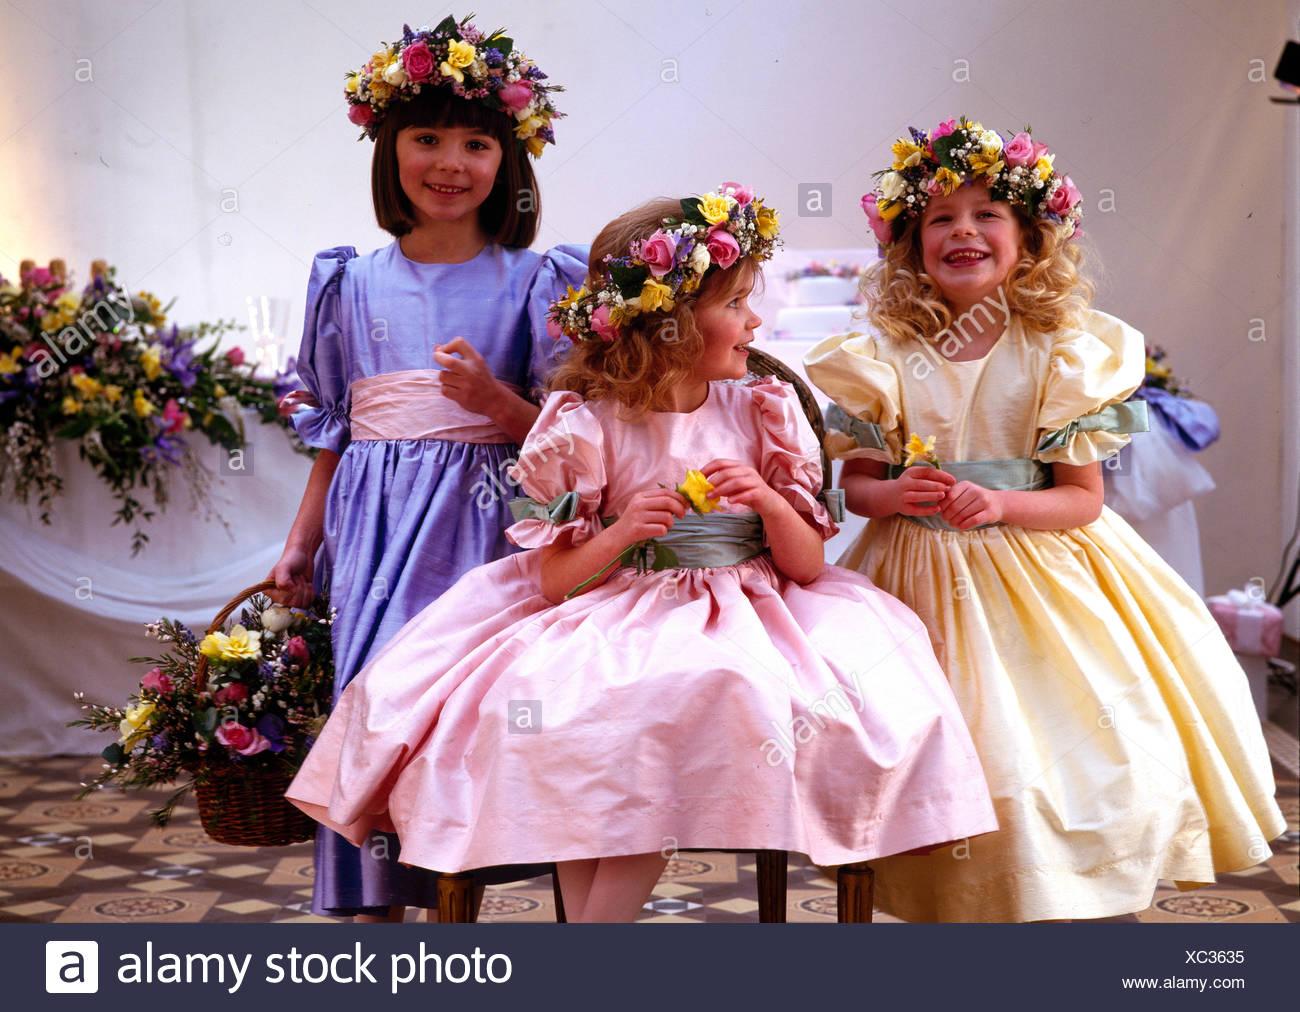 Bridesmaids Dresses Imágenes De Stock & Bridesmaids Dresses Fotos De ...